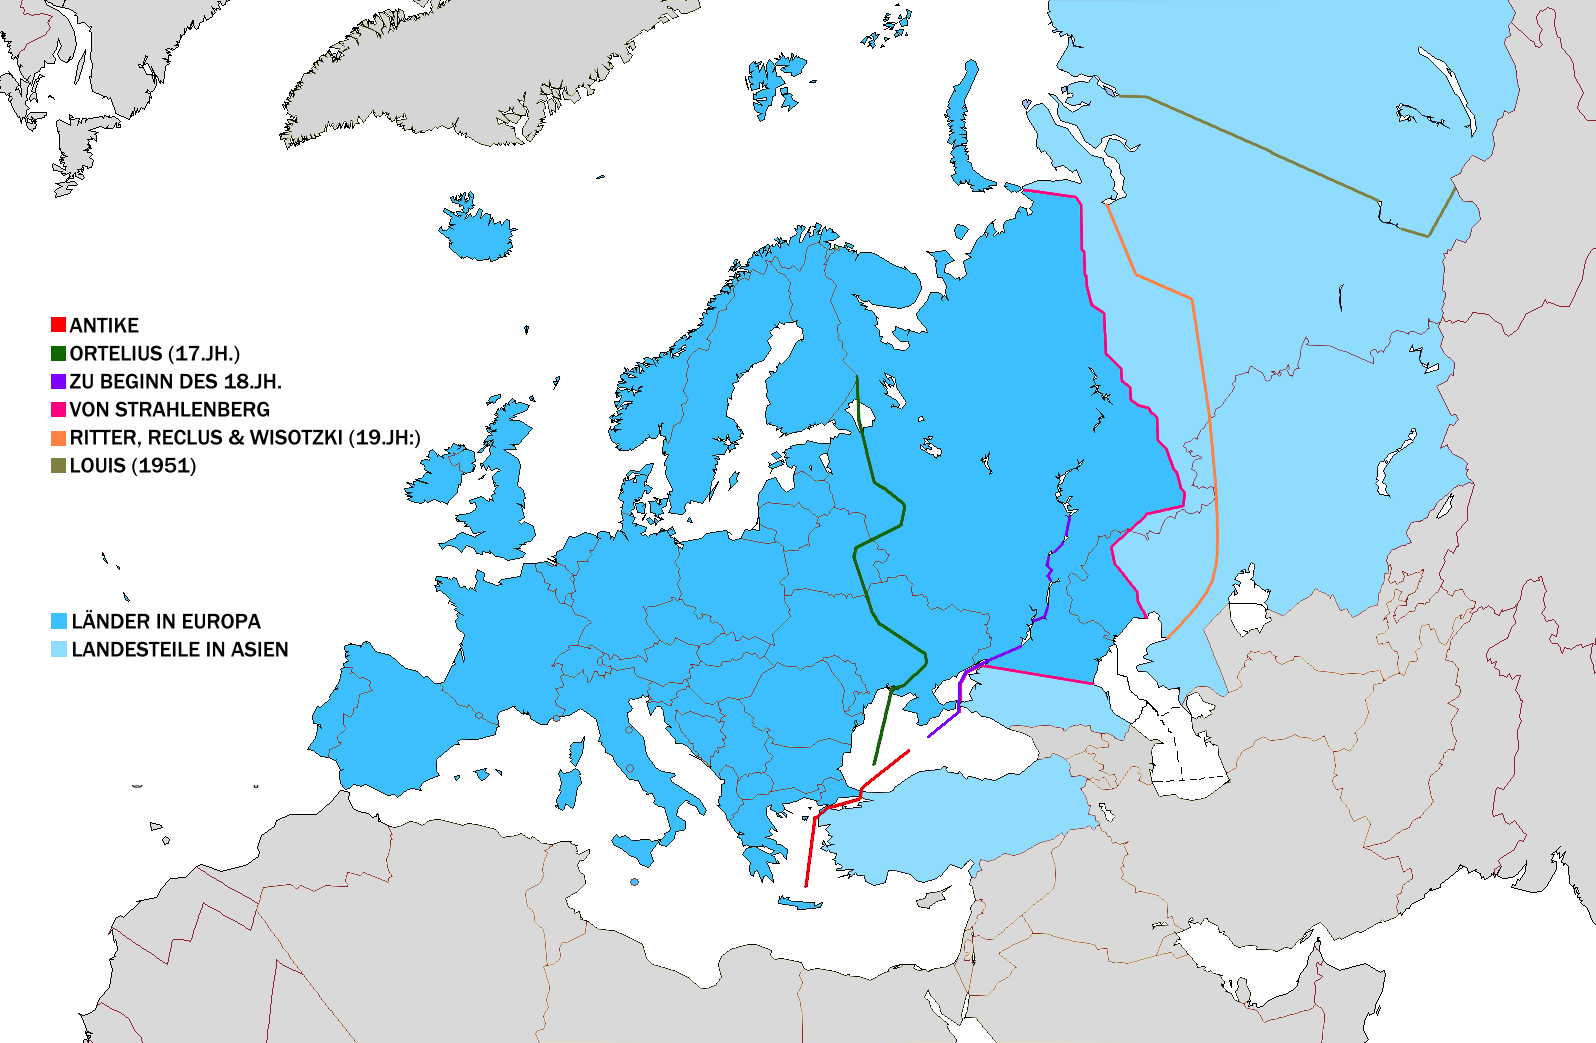 File:Europa geografisch karte de 1.png - Wikimedia Commons